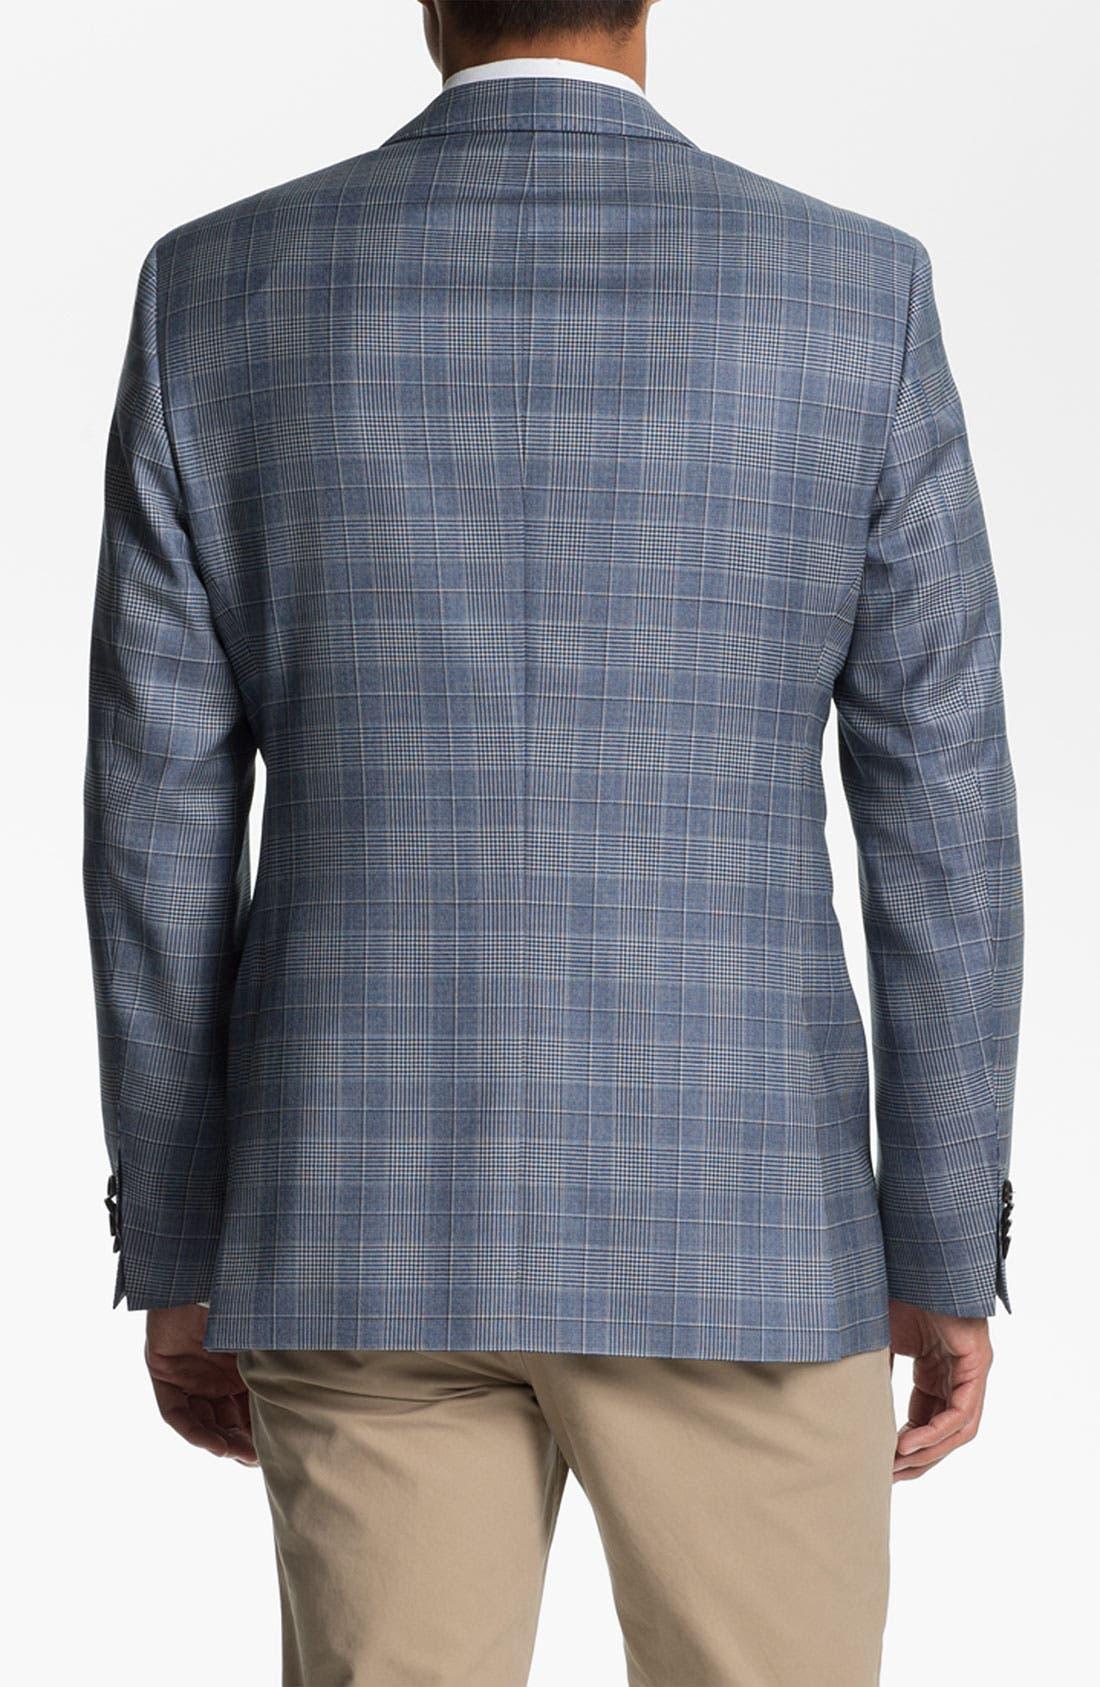 ZZDNUHUGO BOSS, BOSS Black 'James' Trim Fit Plaid Sportcoat, Alternate thumbnail 5, color, 460